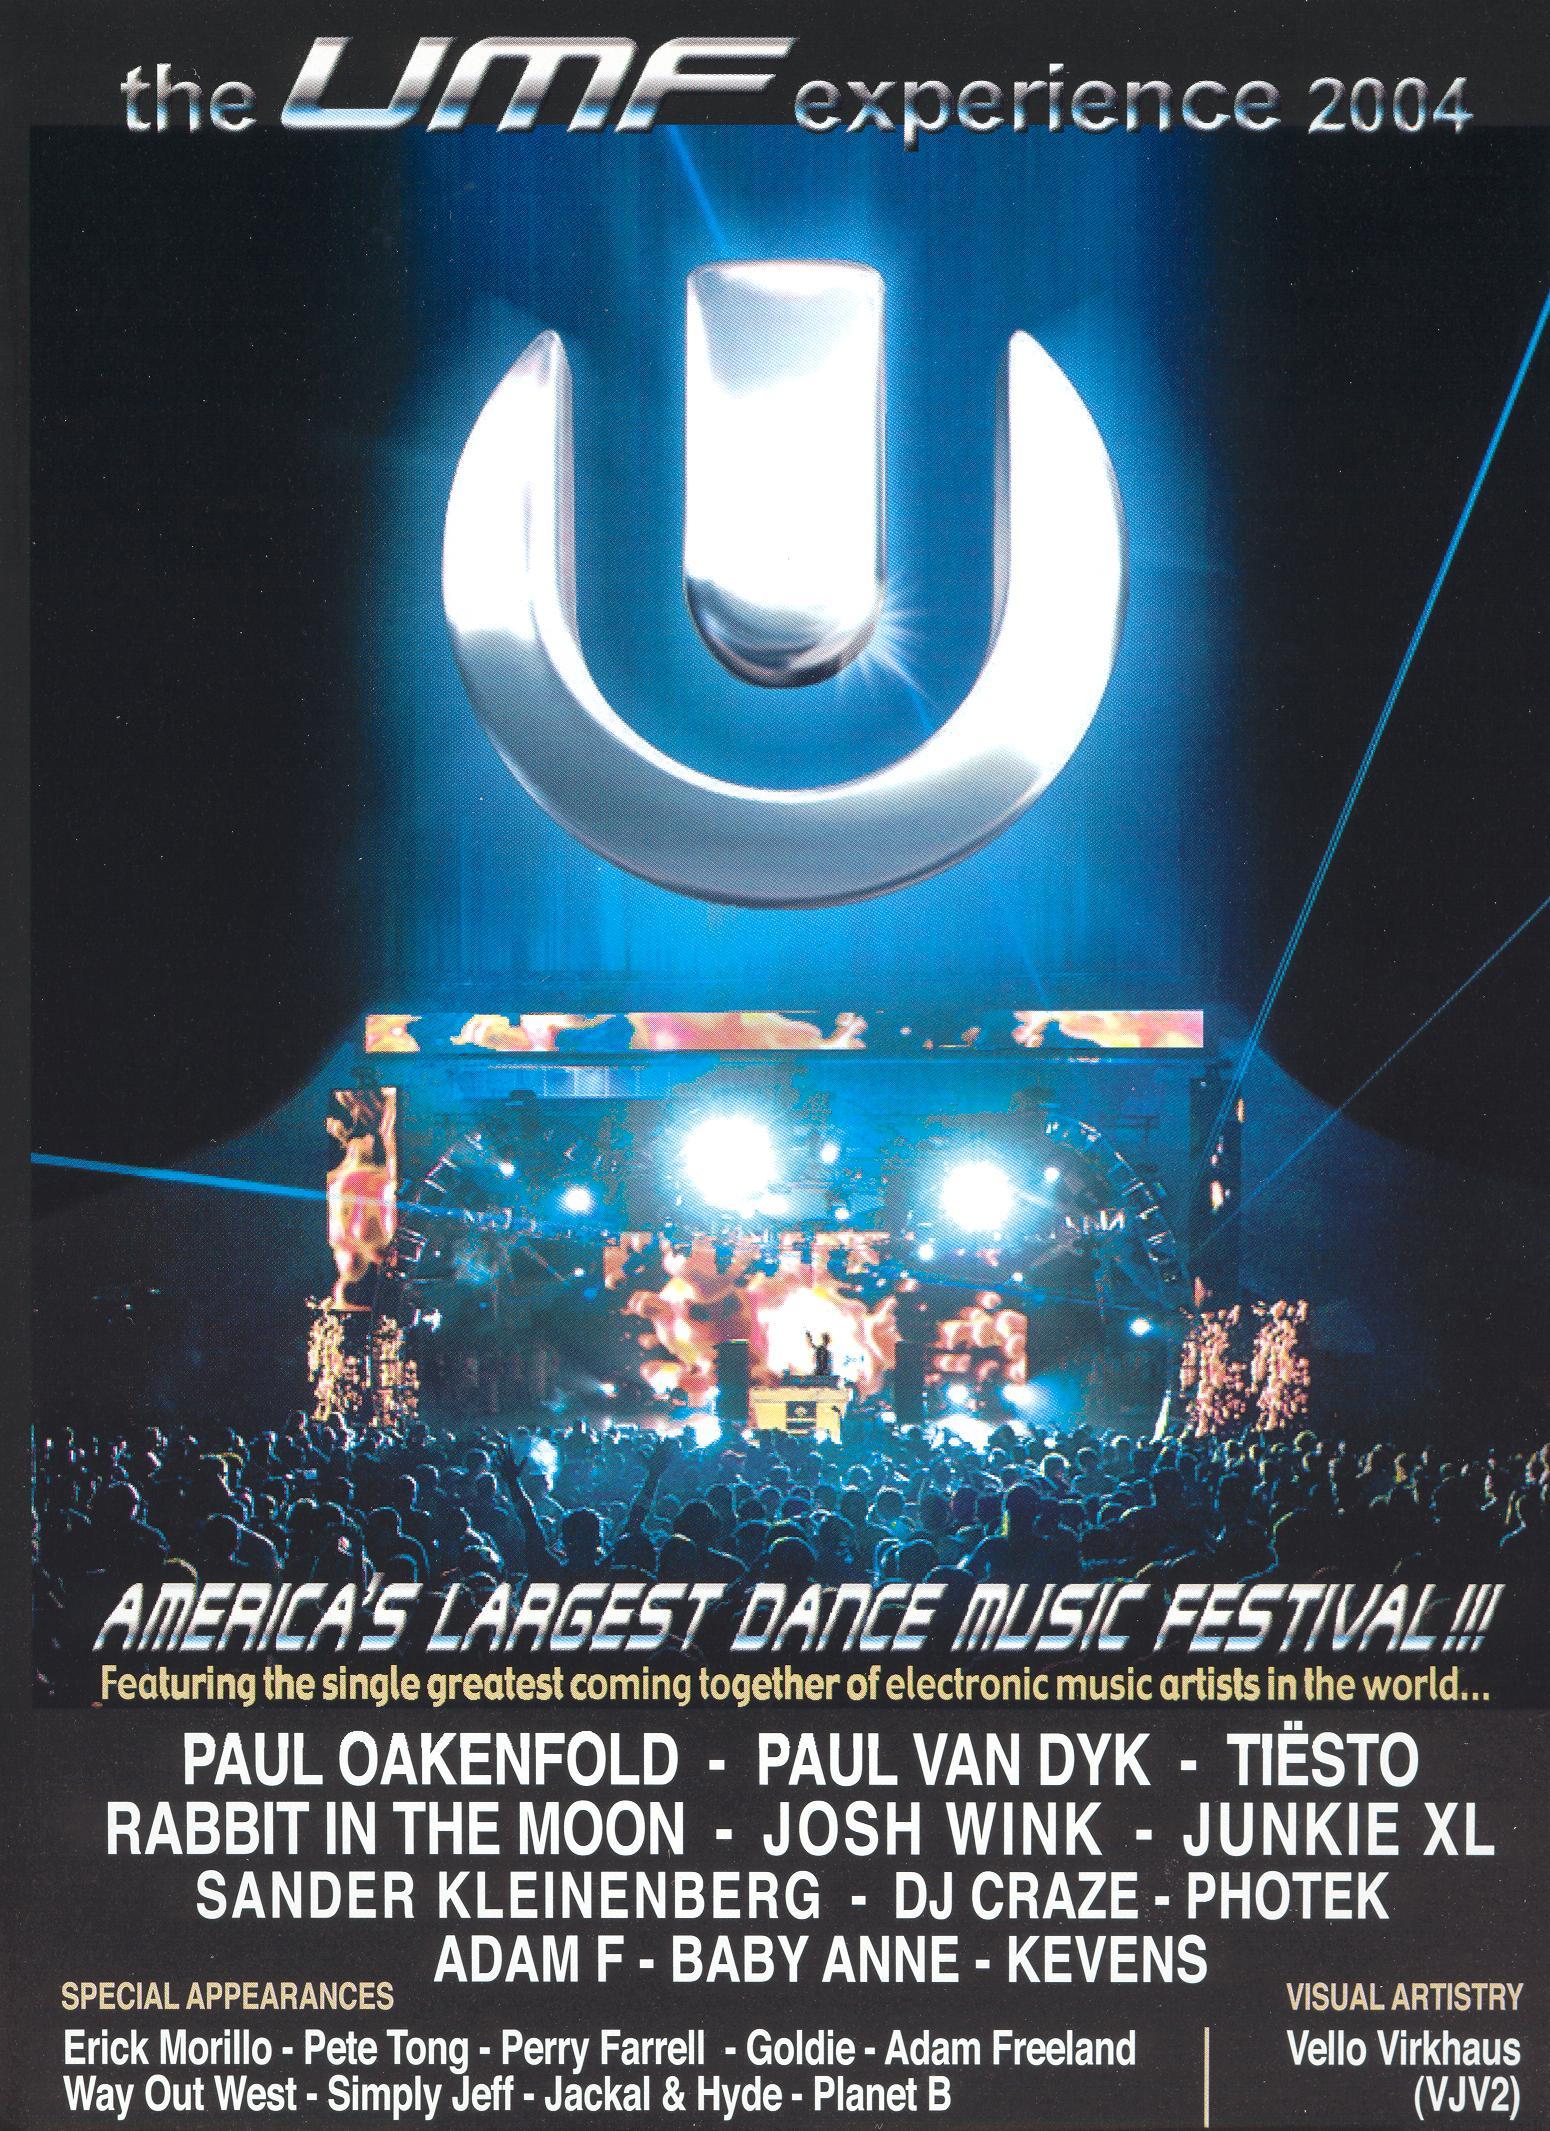 UMF Experience 2004